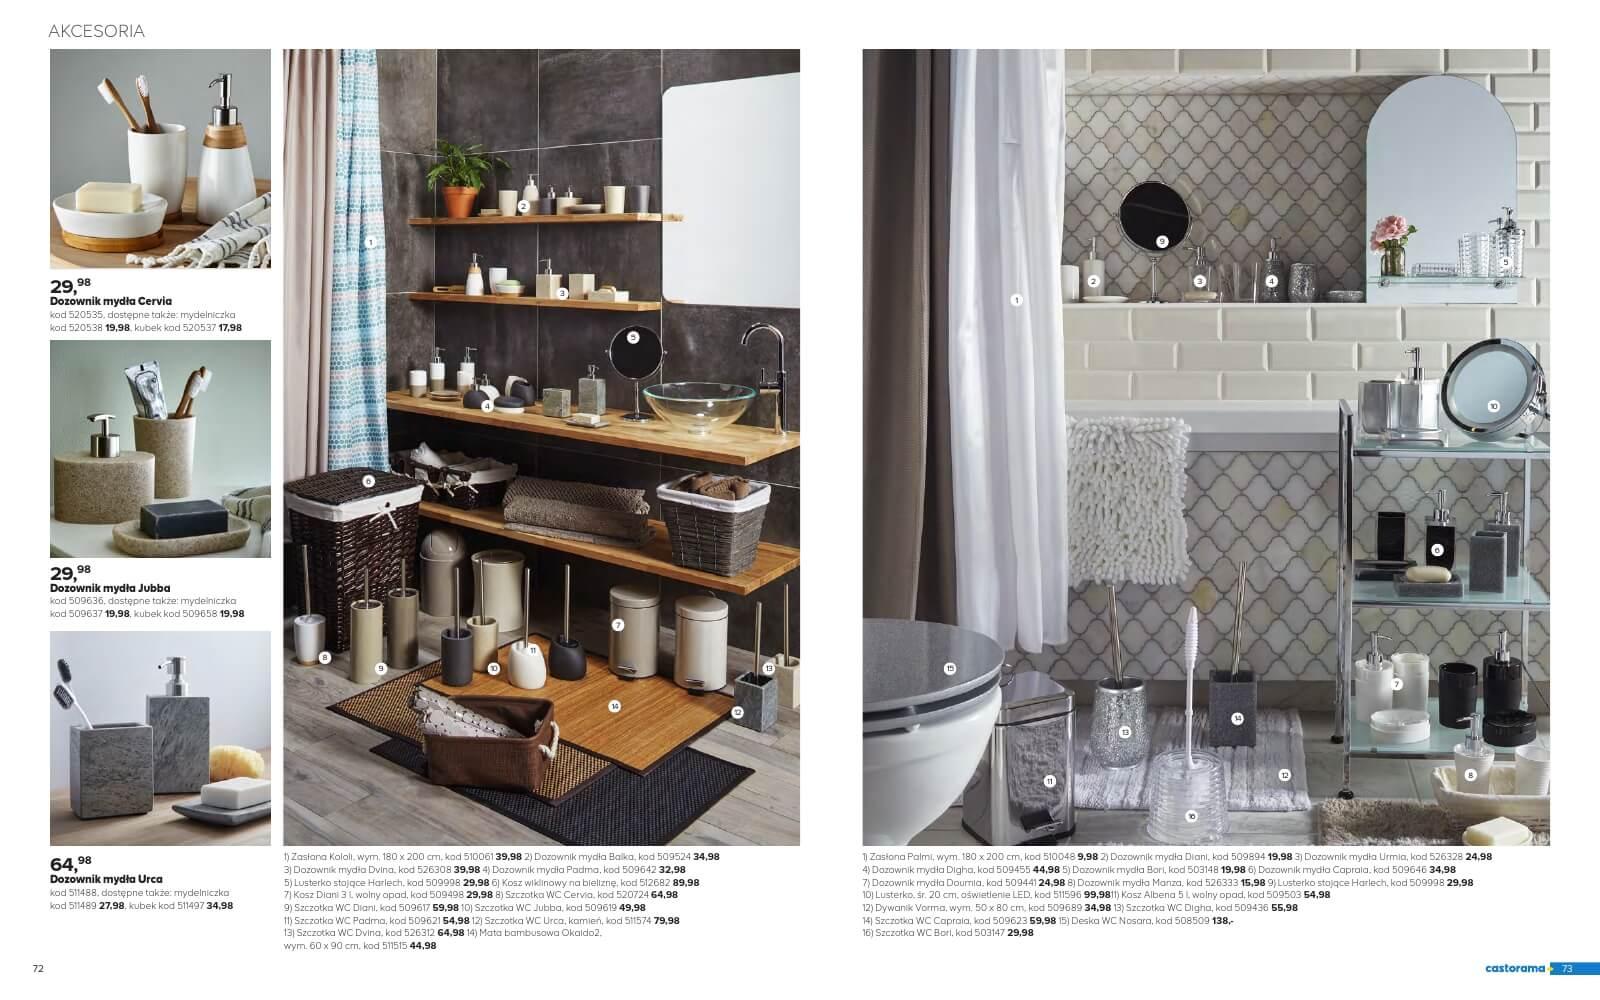 Castorama Katalog łazienka 2018 Str37